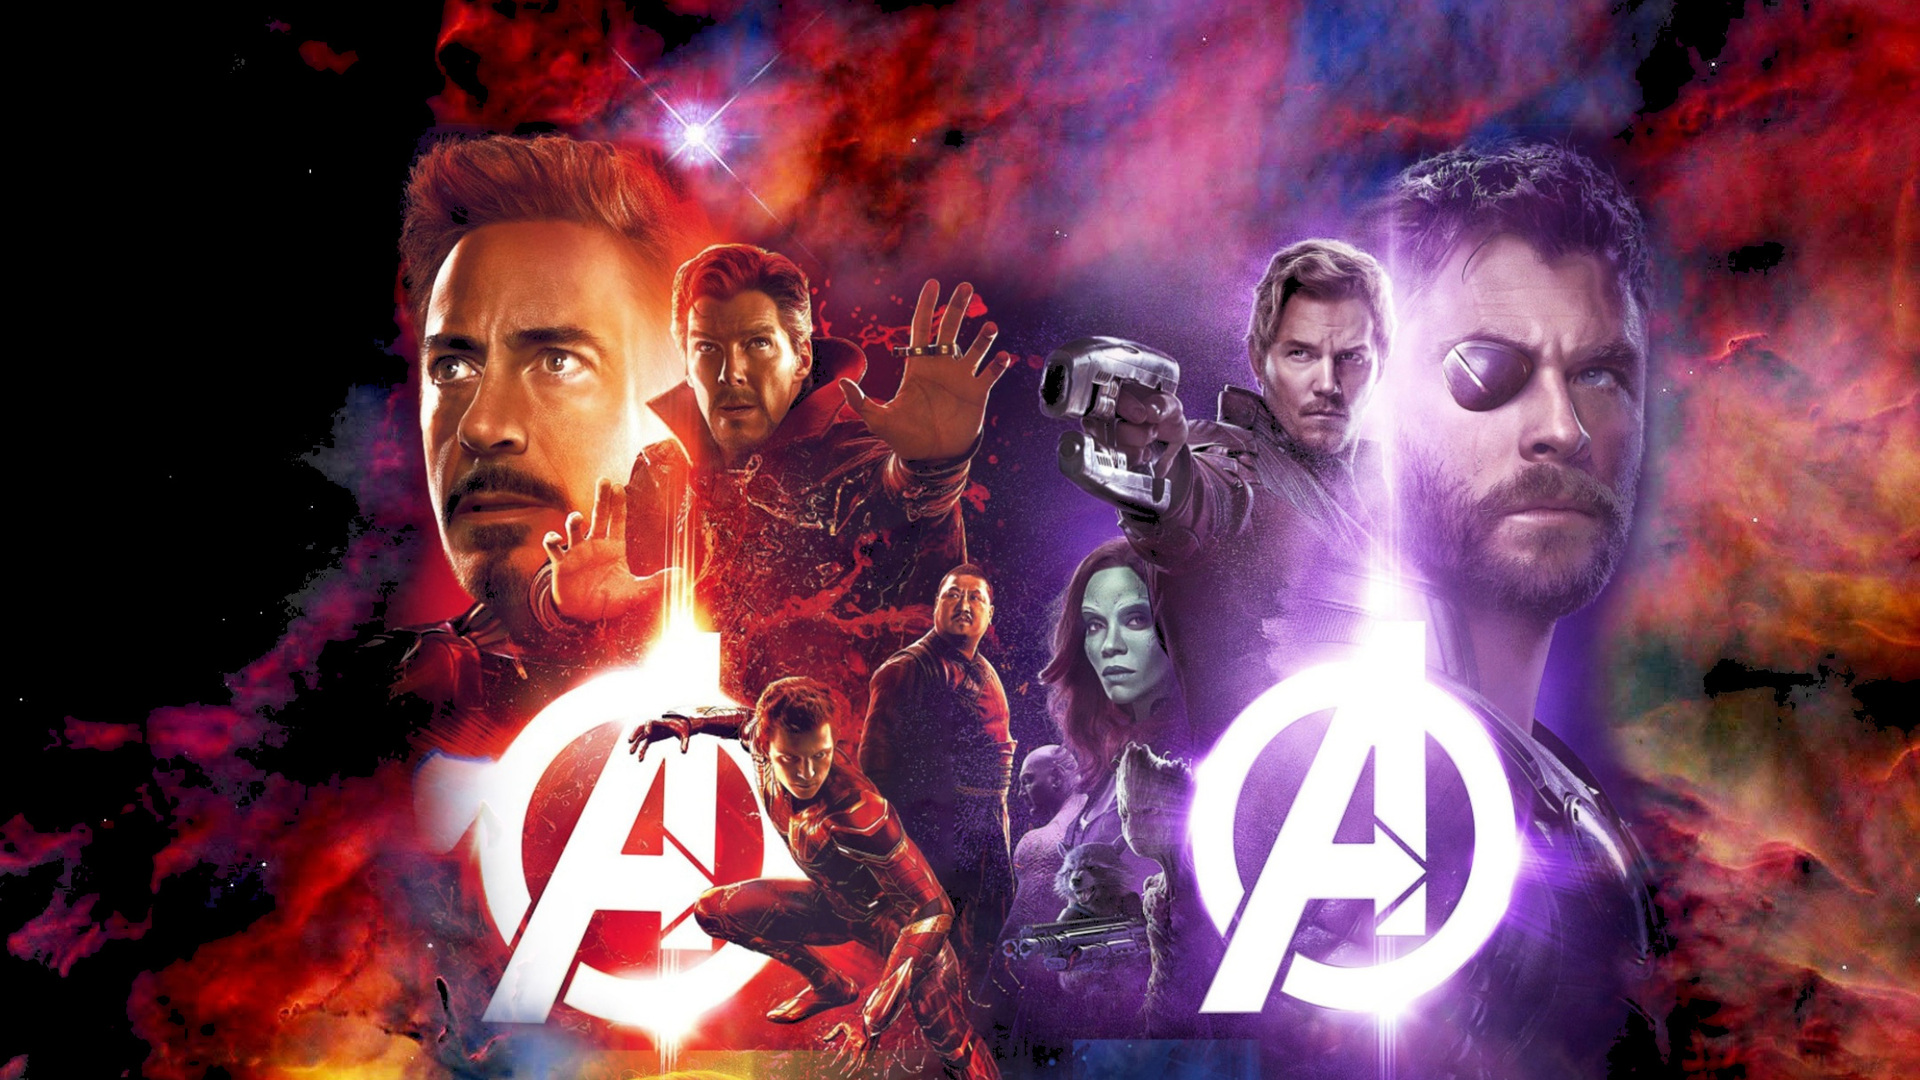 1920x1080 Avengers Infinity War Movie Laptop Full HD 1080P ...